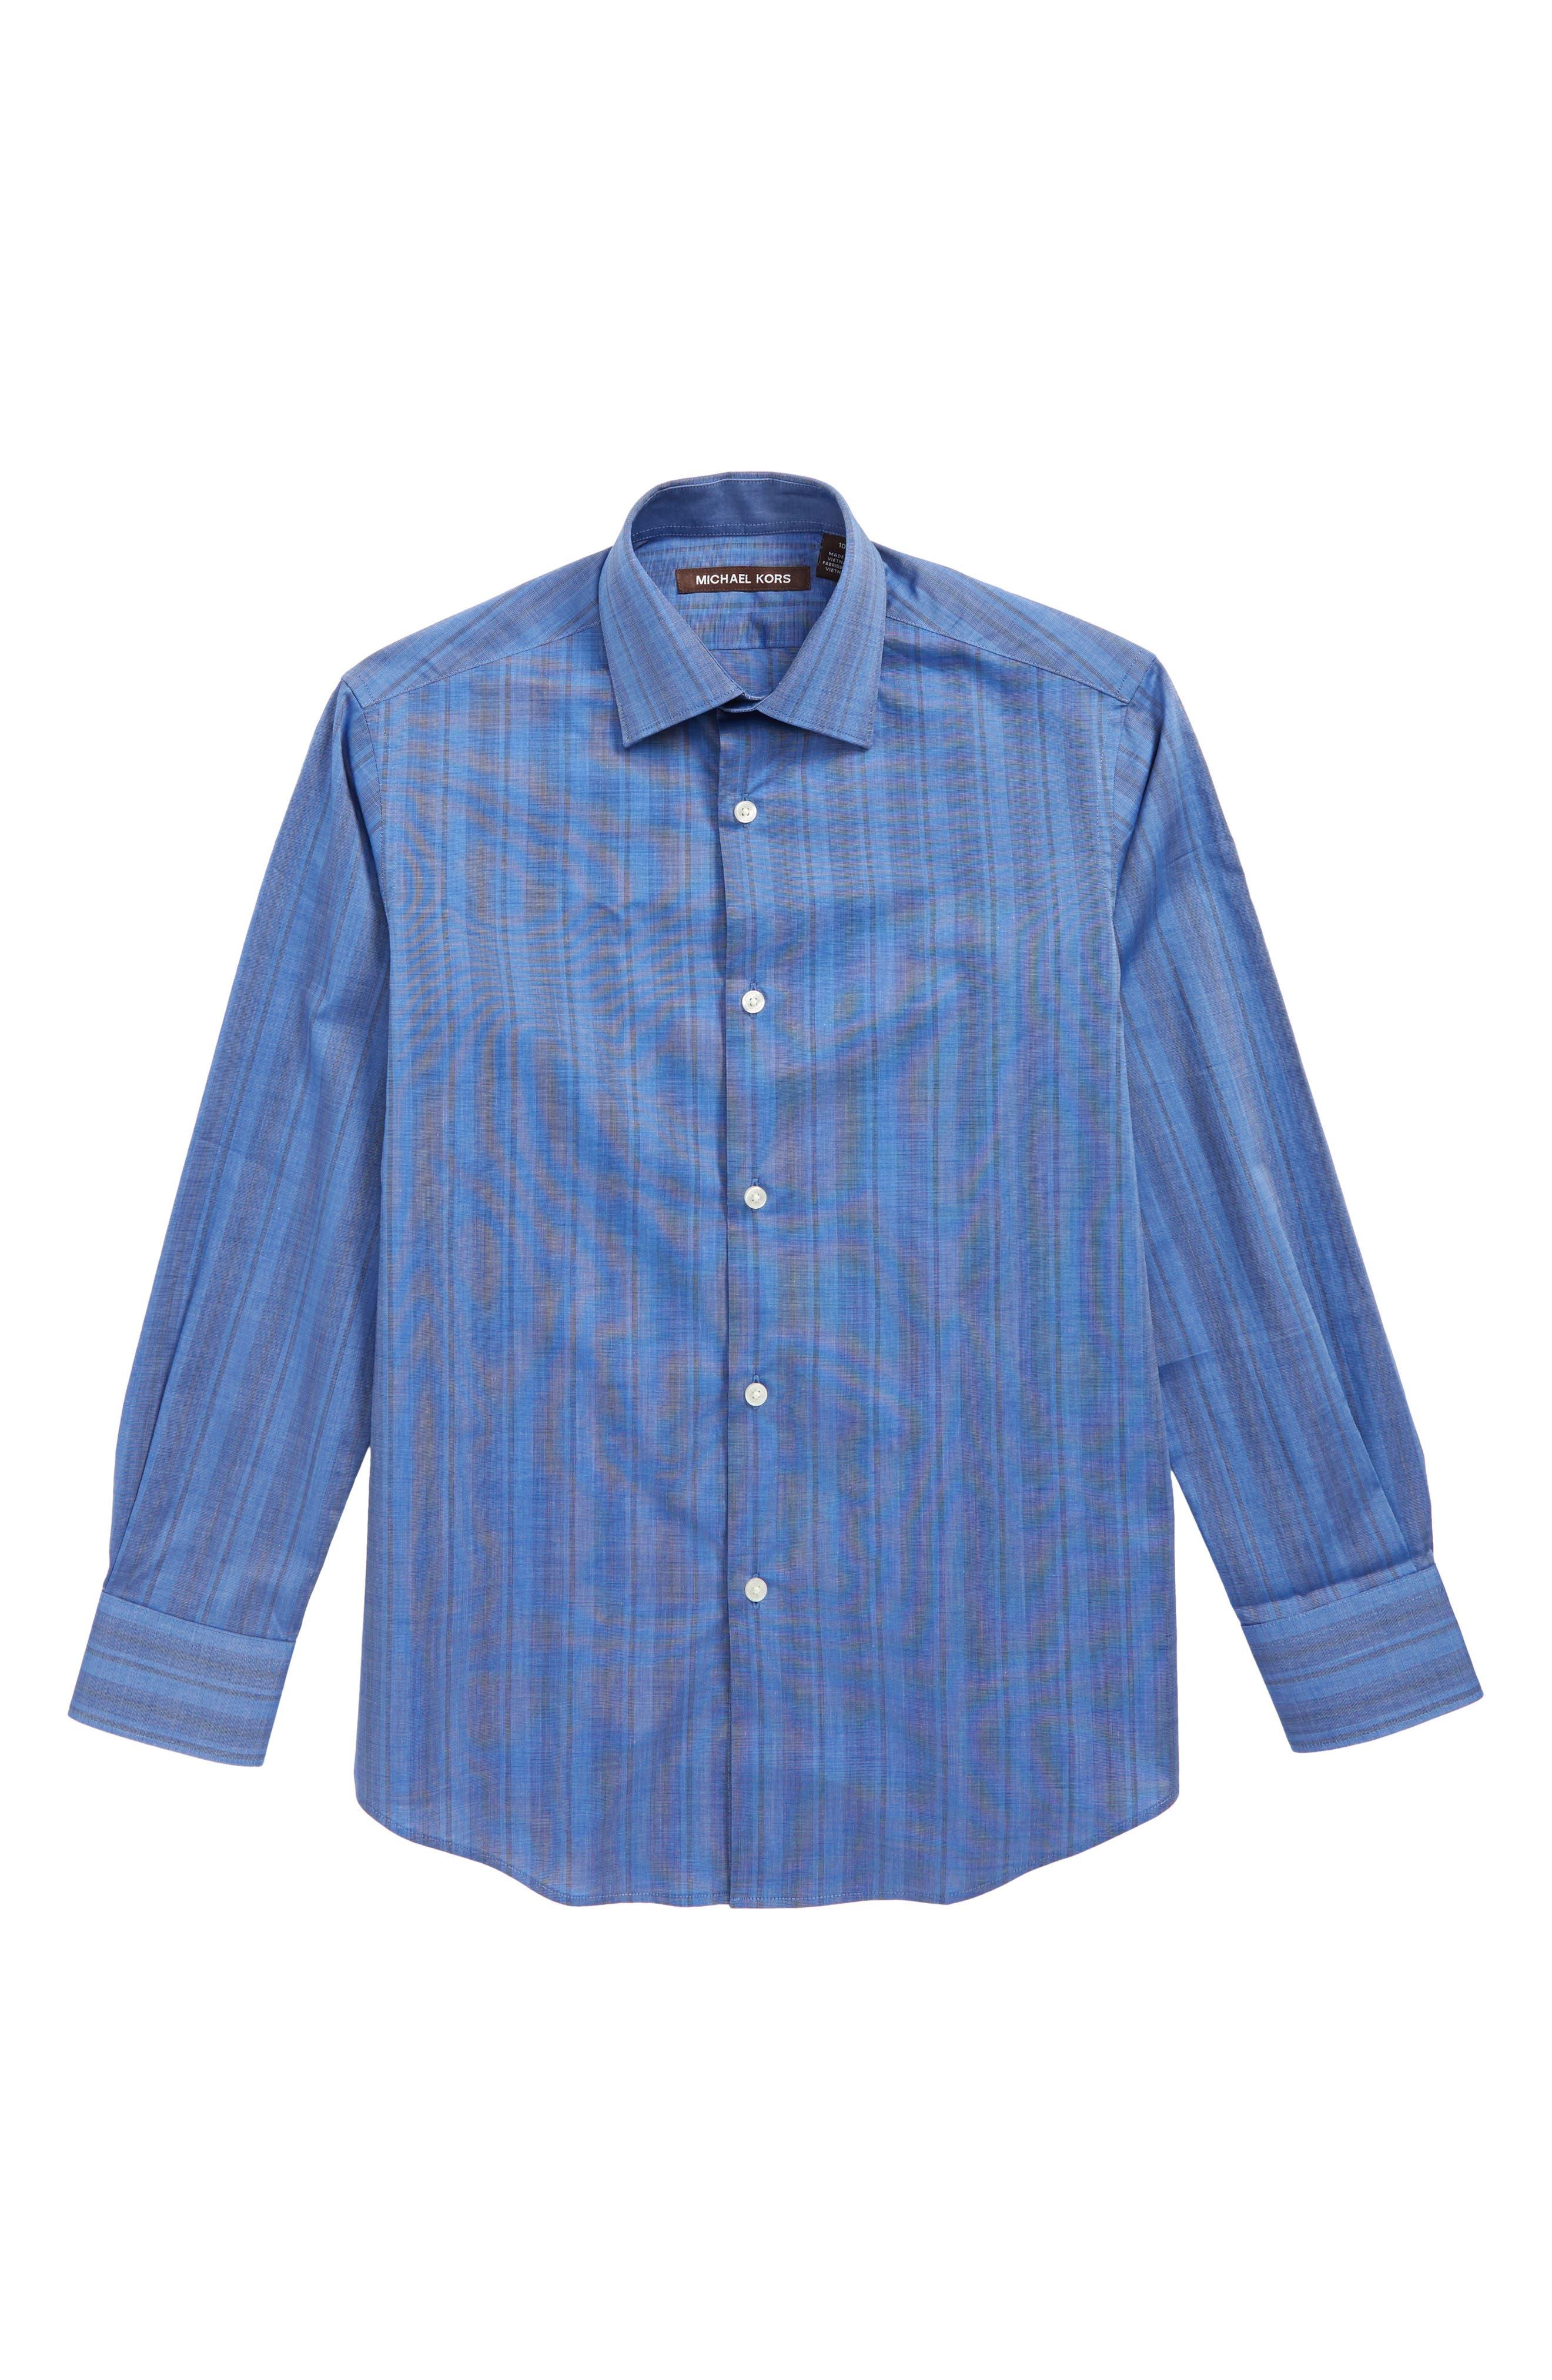 Image of Michael Kors Stripe Dress Shirt